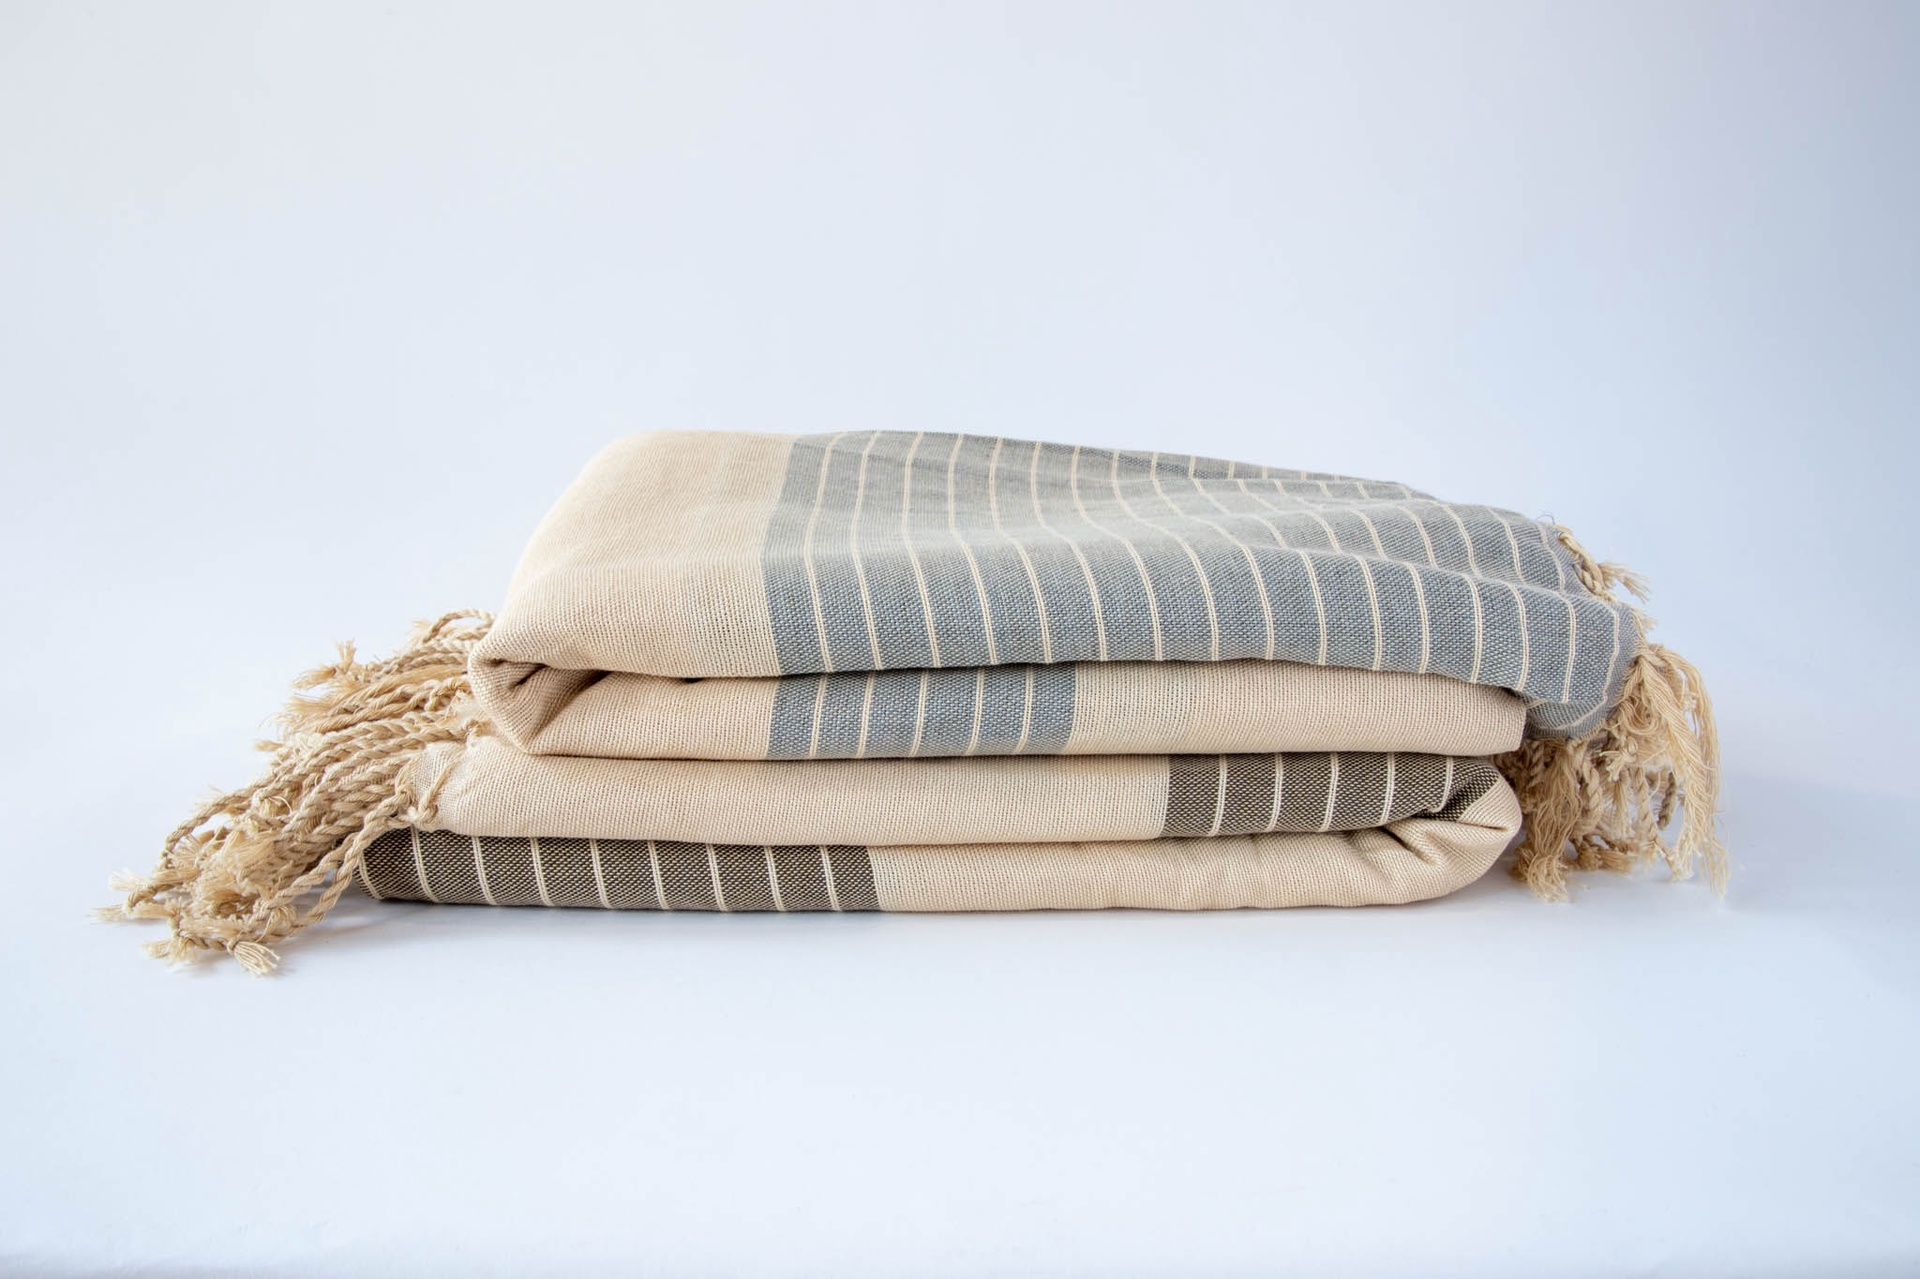 HandMade Woven Blankets